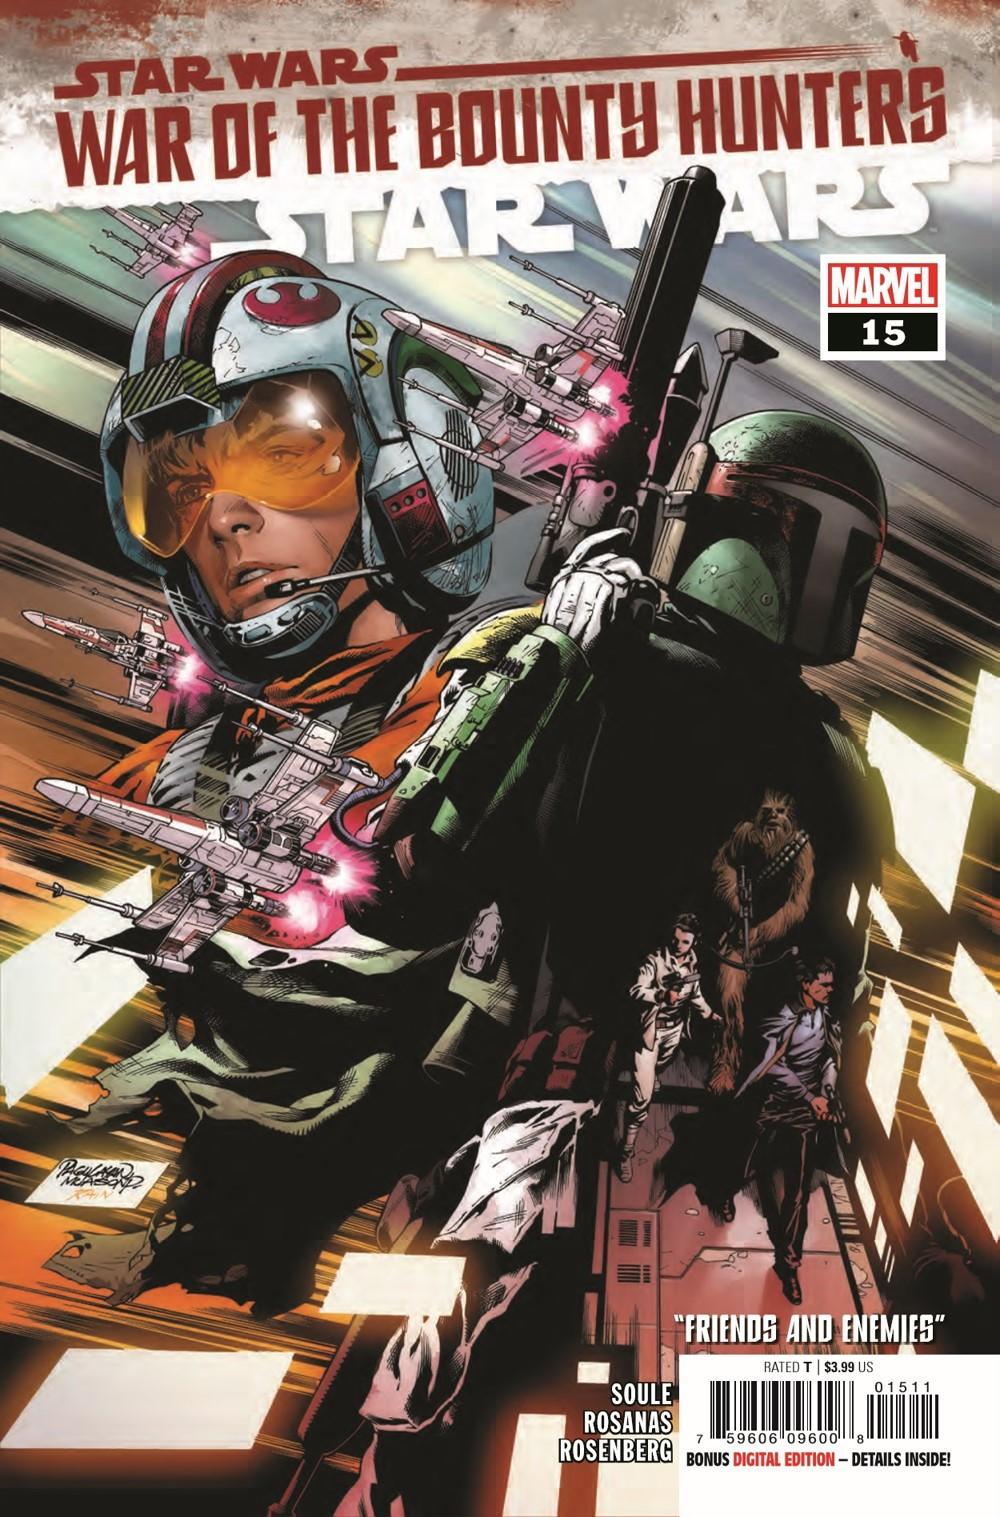 STWARS2020015_Preview-1-1 ComicList Previews: STAR WARS #15